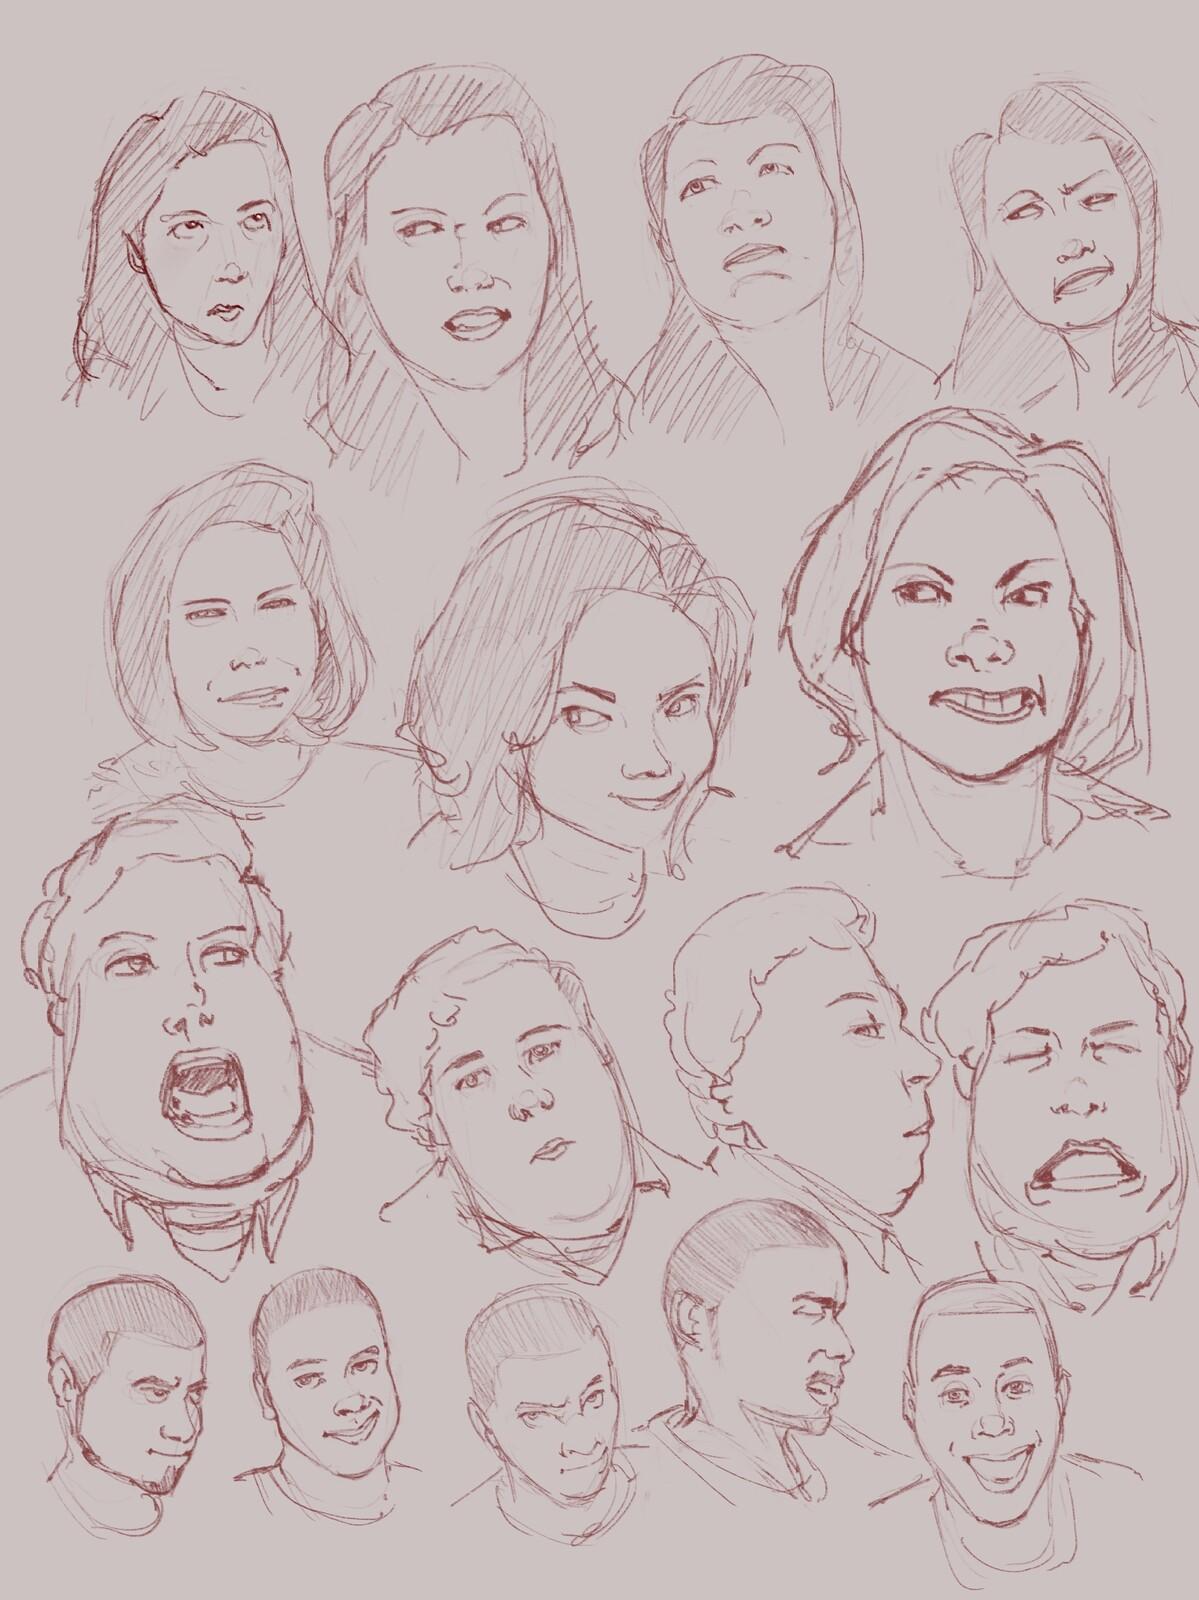 Still more expressions!